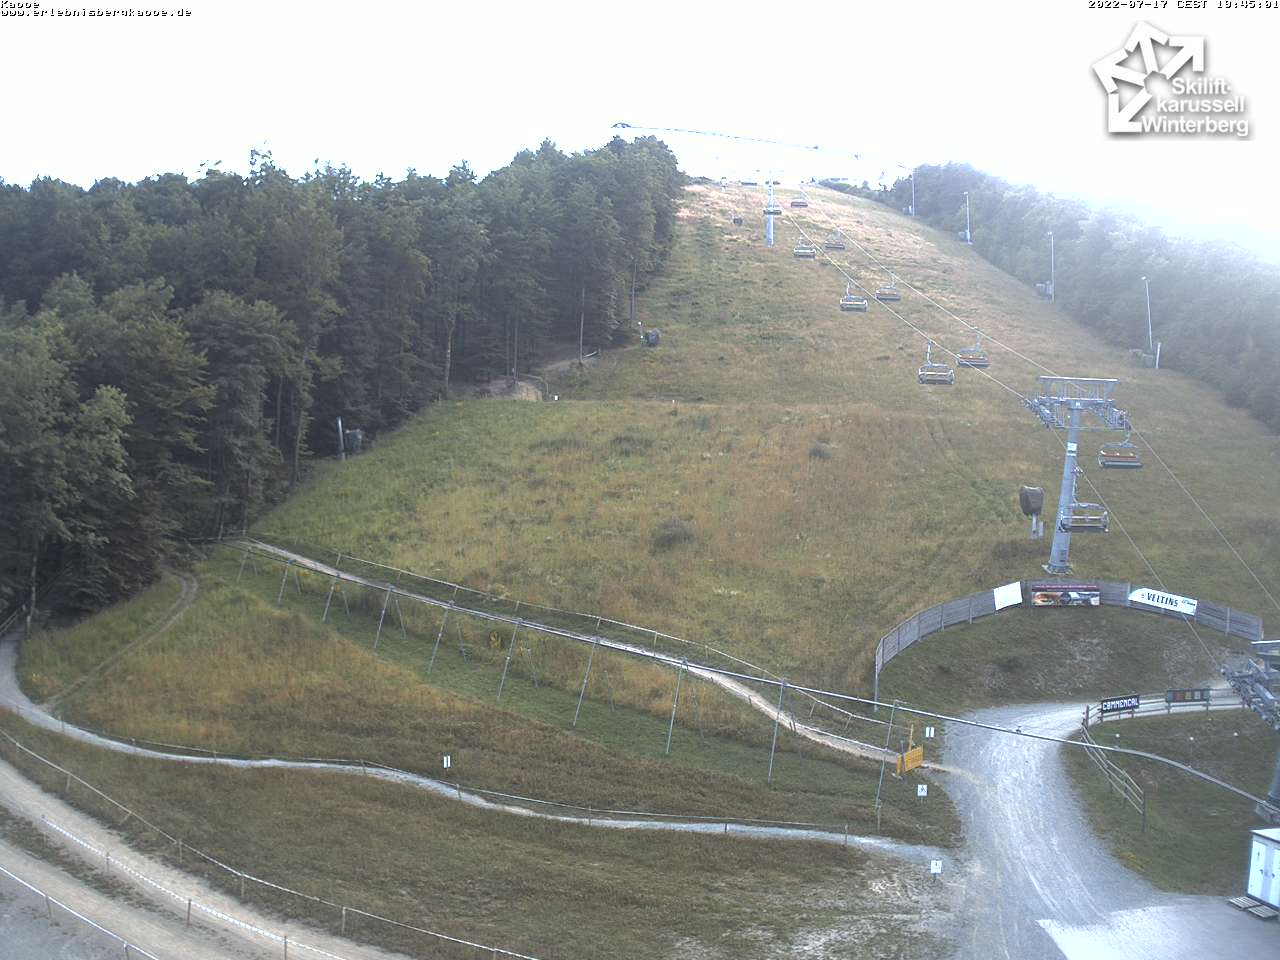 Slalomhang, Winterberg